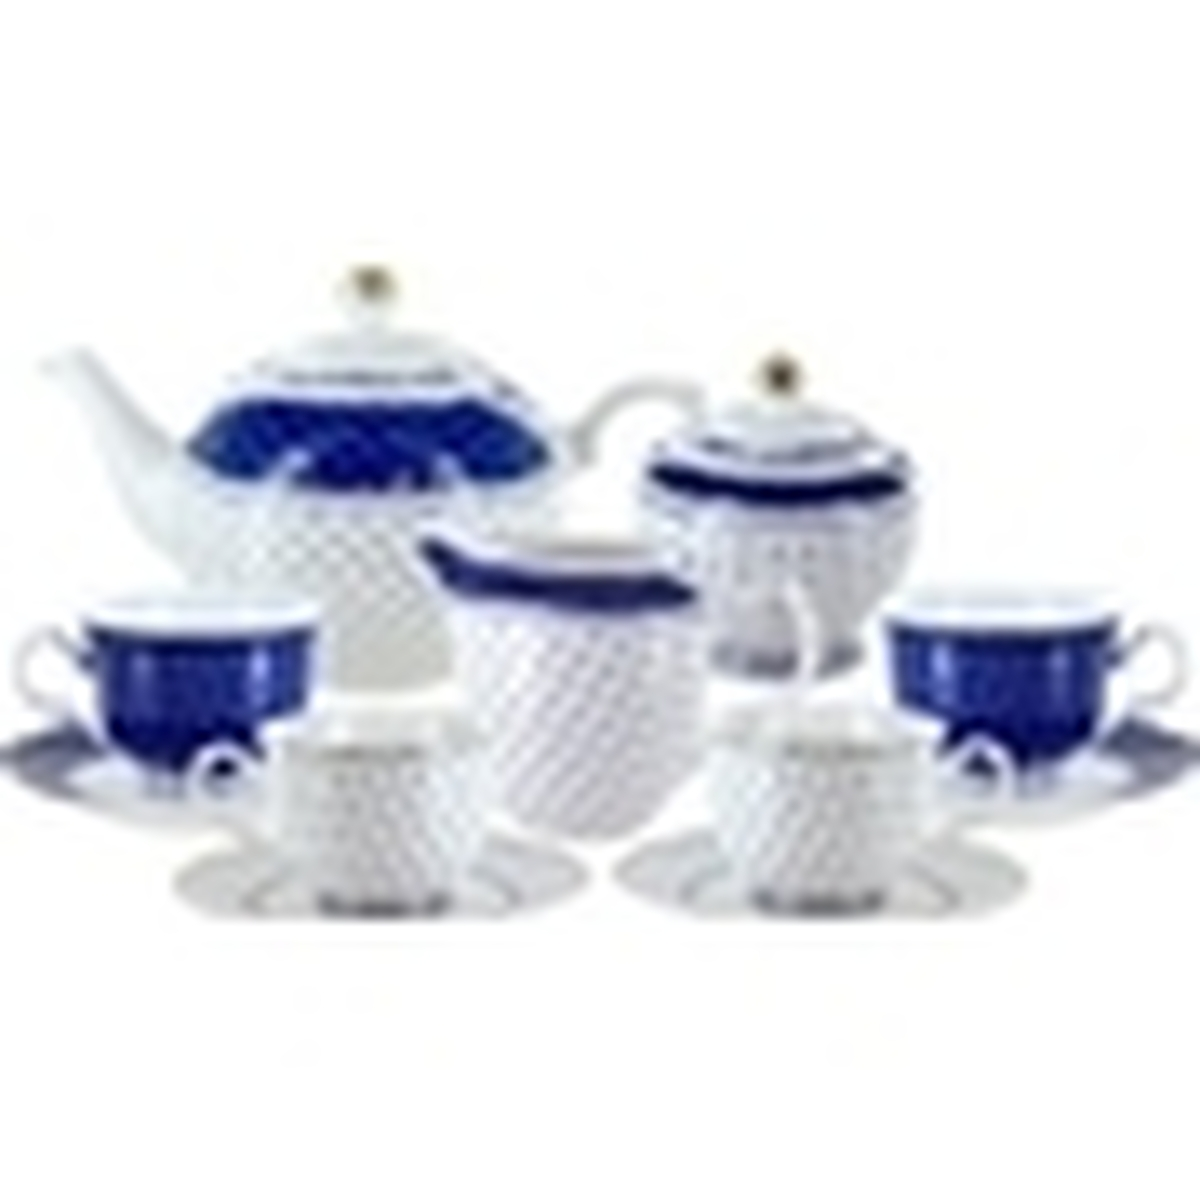 Blue Twinkle Porcelain Tea Set